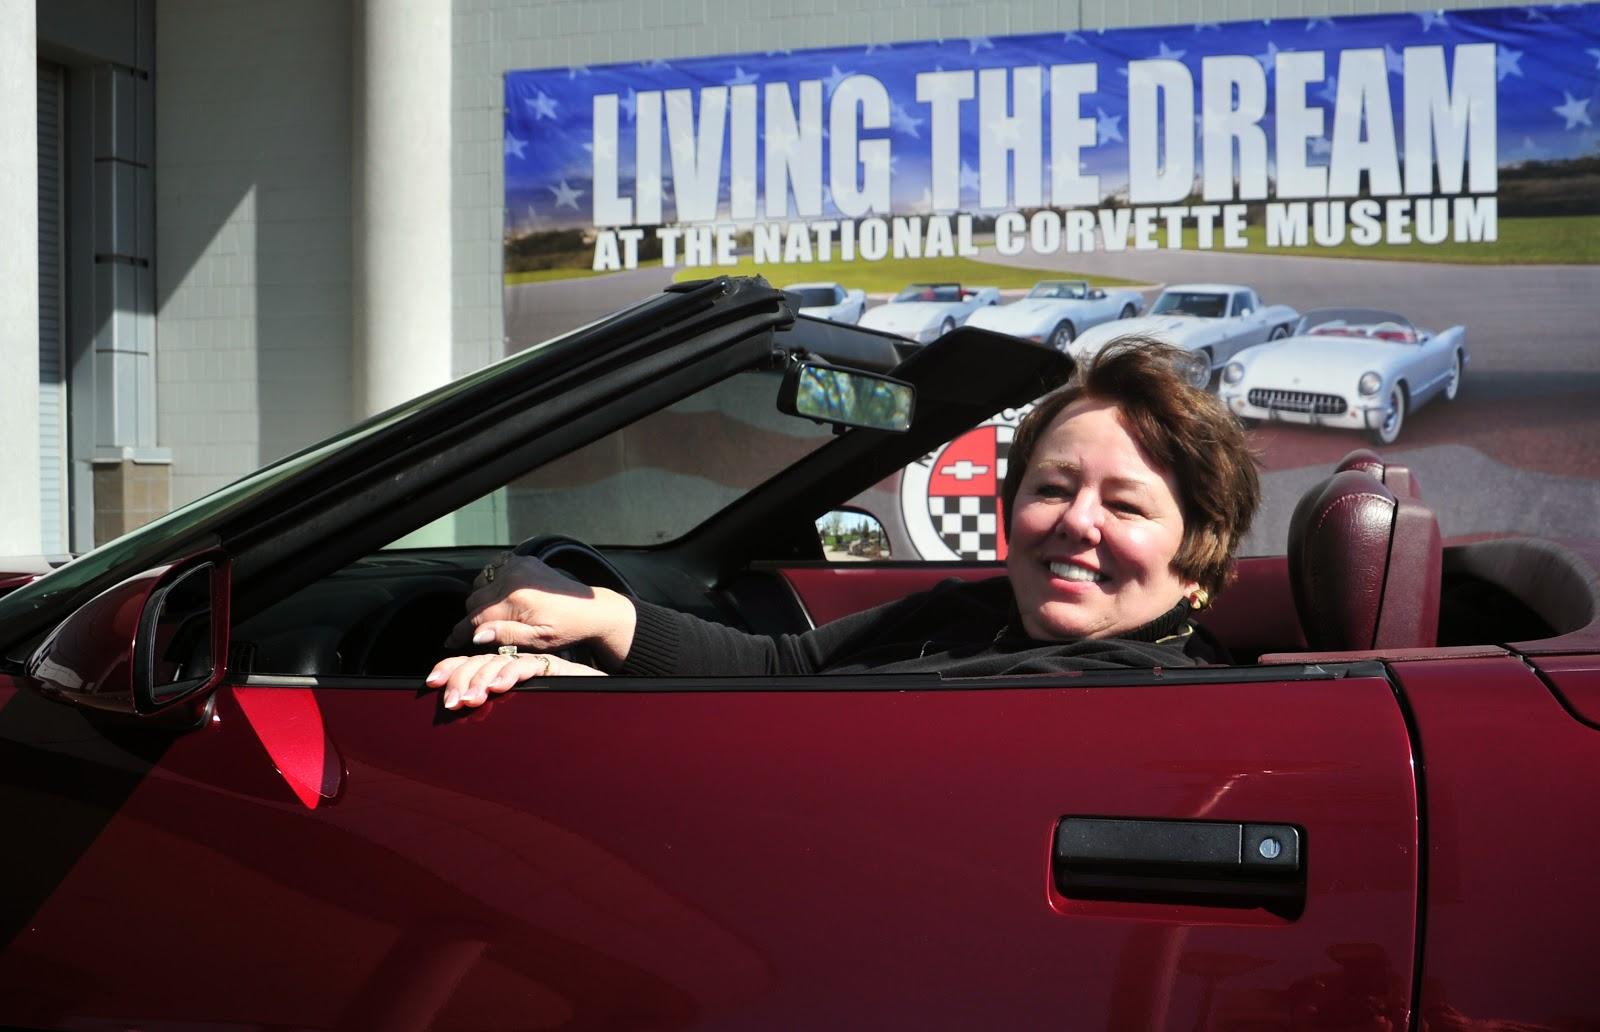 National Corvette Museum >> Woman Donates 40th Anniversary Corvette To The National